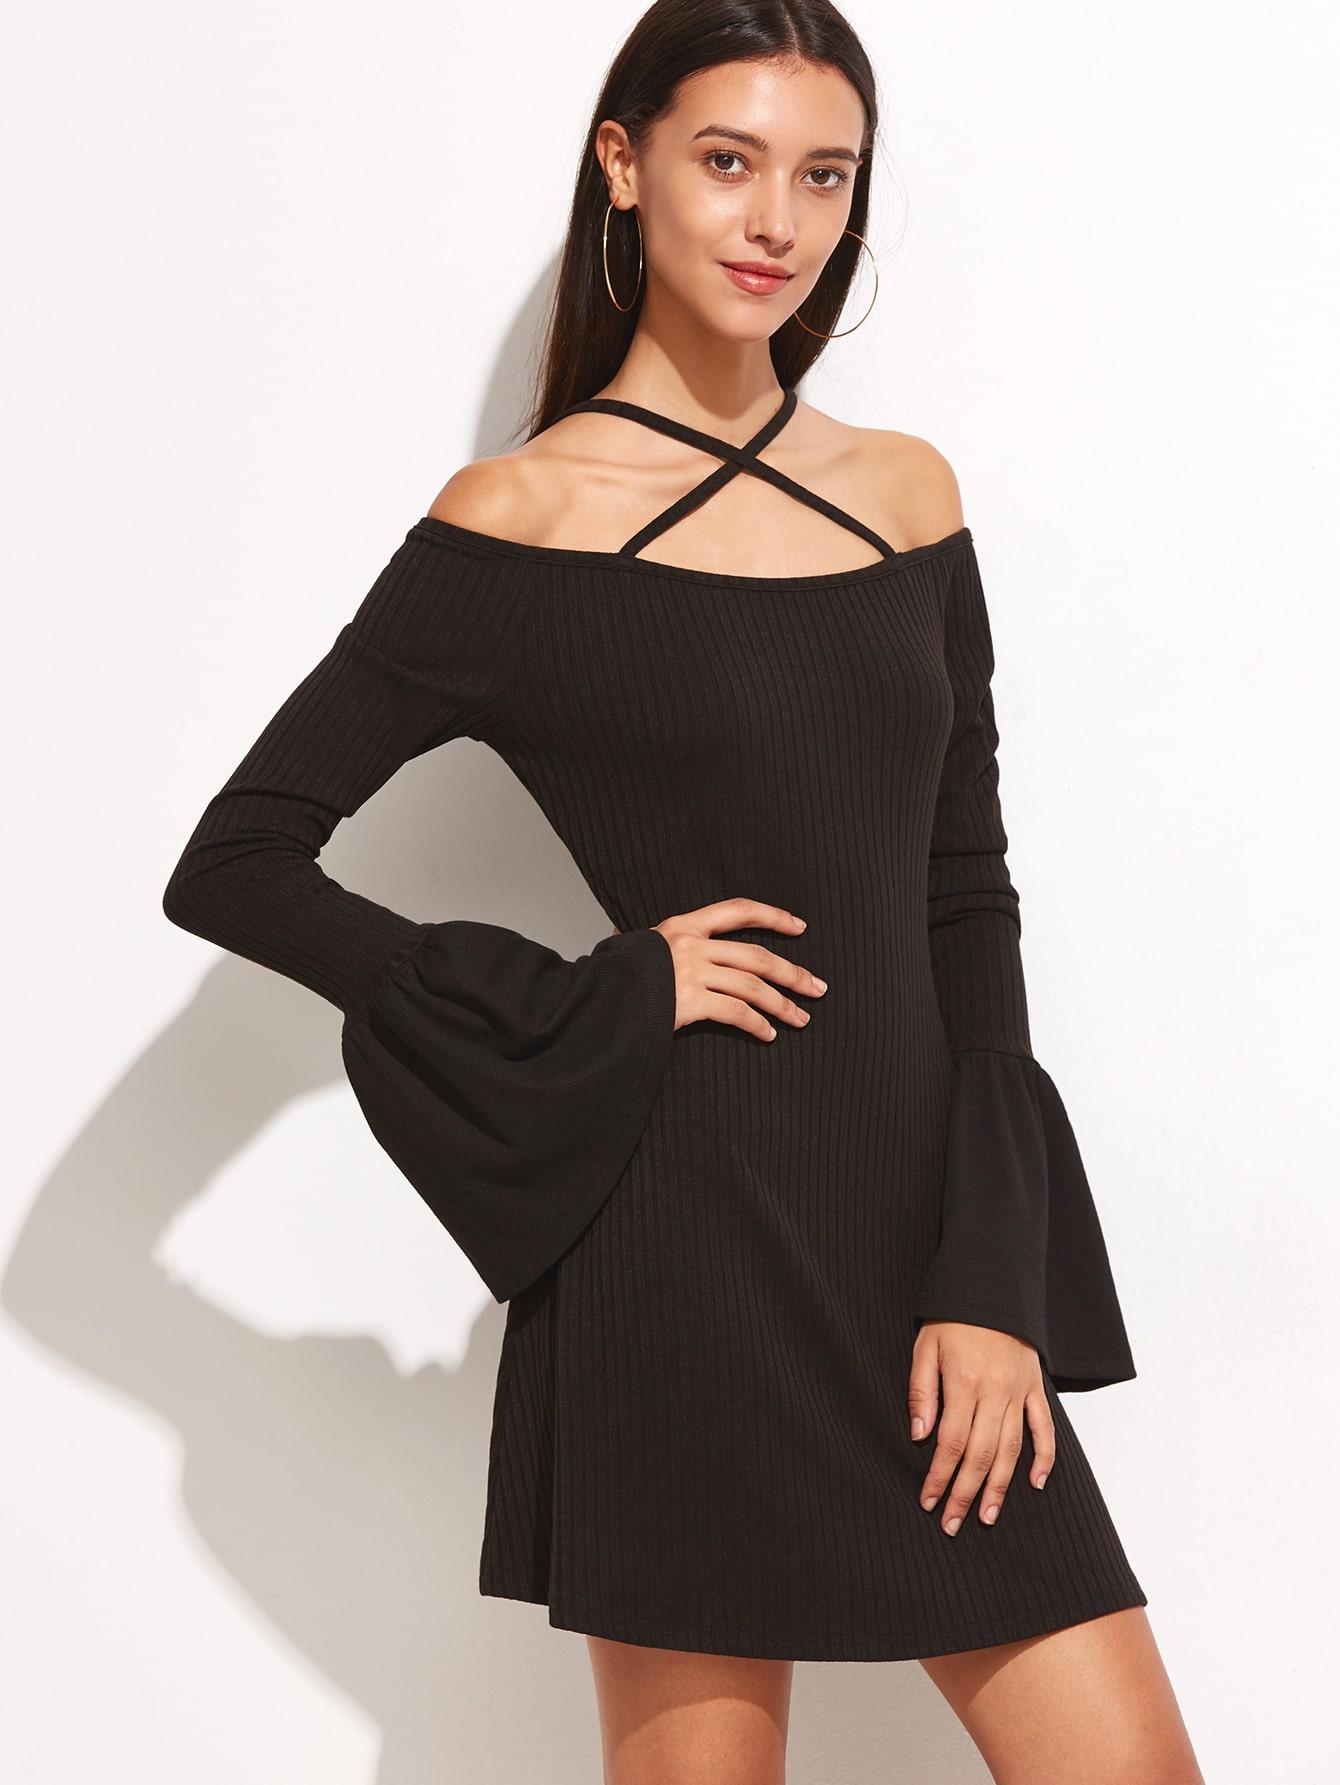 Black Crisscross Cold Shoulder Bell Cuff Ribbed Dress dress160921705